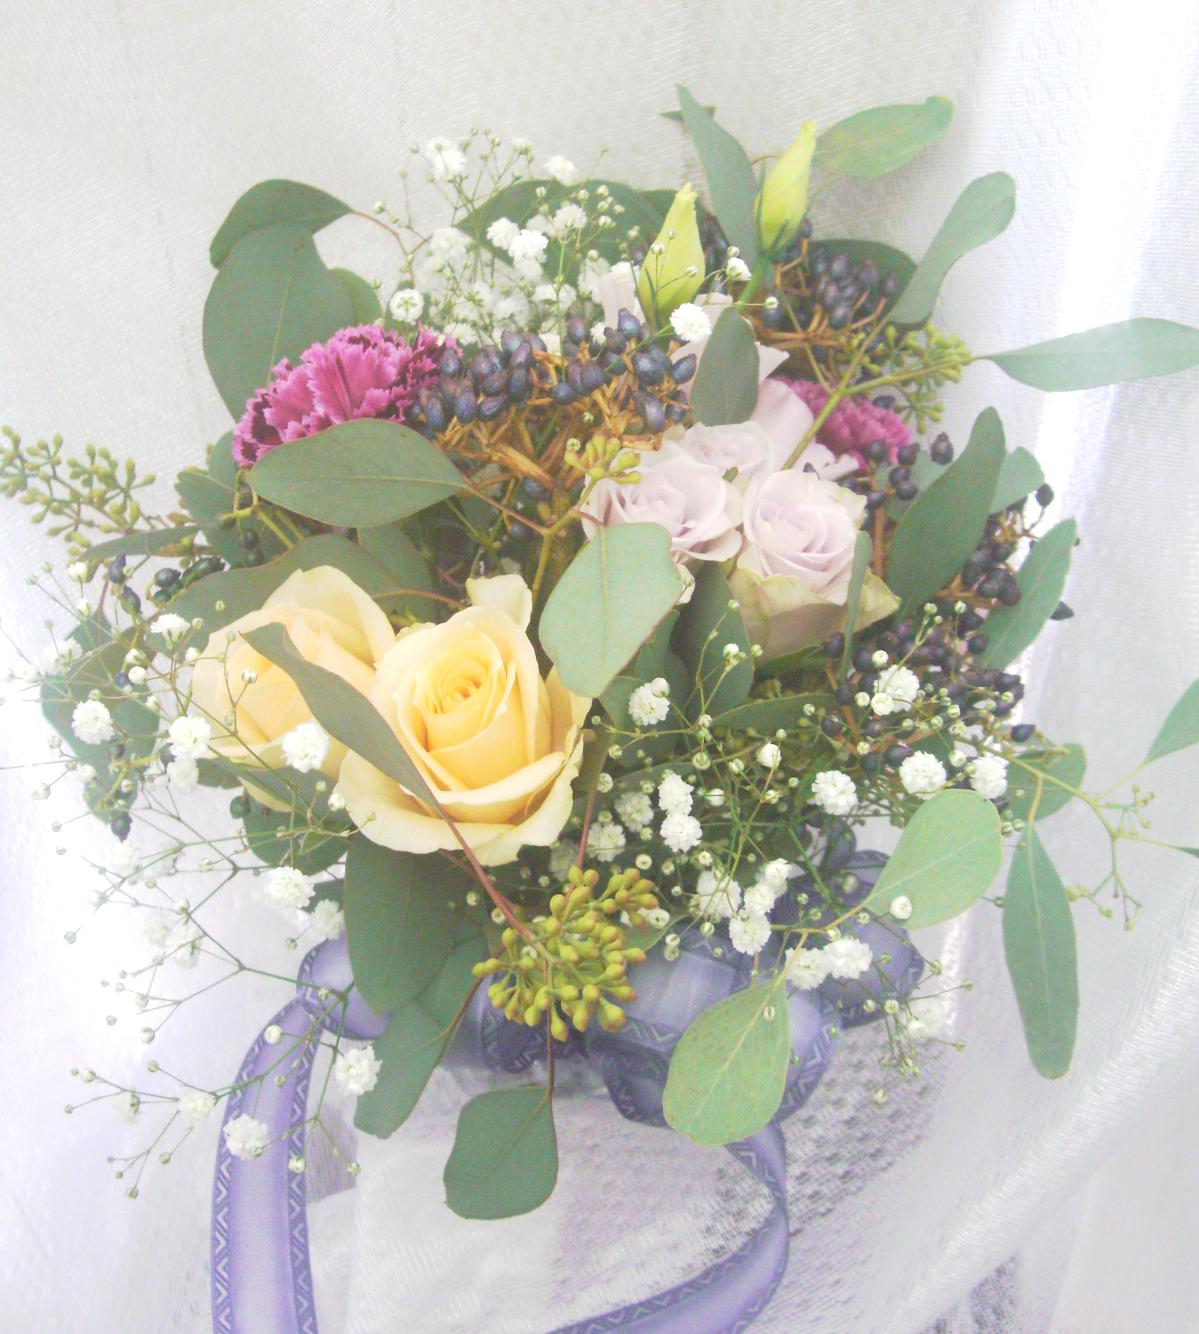 <div>くすみがかった配色で大人バランスのクラッチブーケ。朝摘みたてのお花をナチュラルに束ねたような雰囲気がカジュアル感と大人っぽさを演出。配色のバランスはドレスカラーに合わせて、季節のお花をふんだんにチョイス。<br></div>